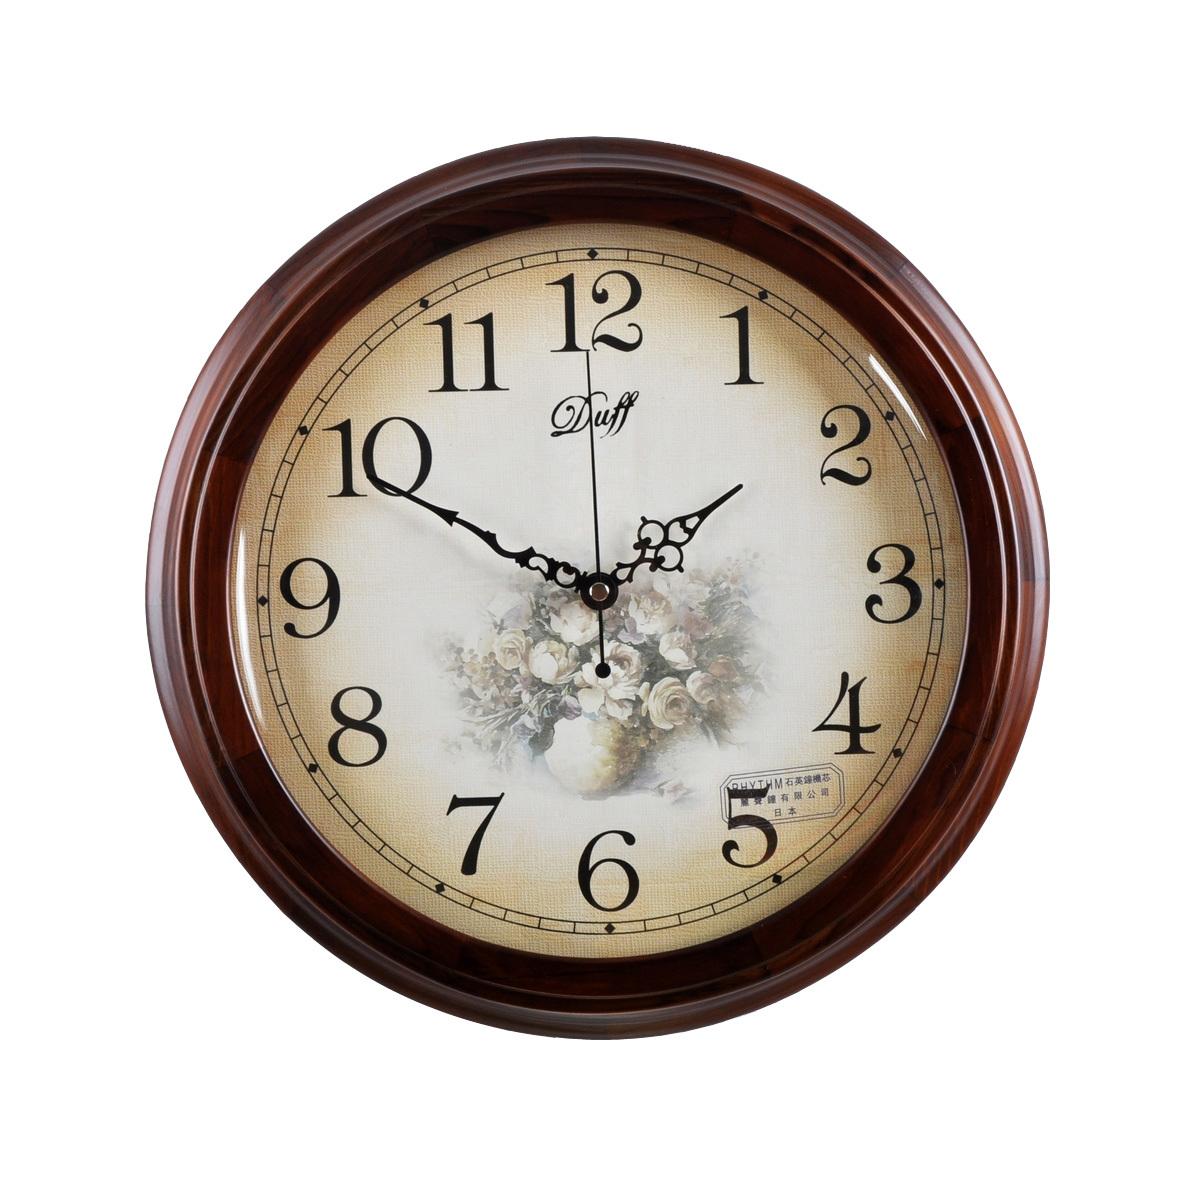 Daf duff fashion rustic silent movement wood quartz clock wall clock 171(China (Mainland))